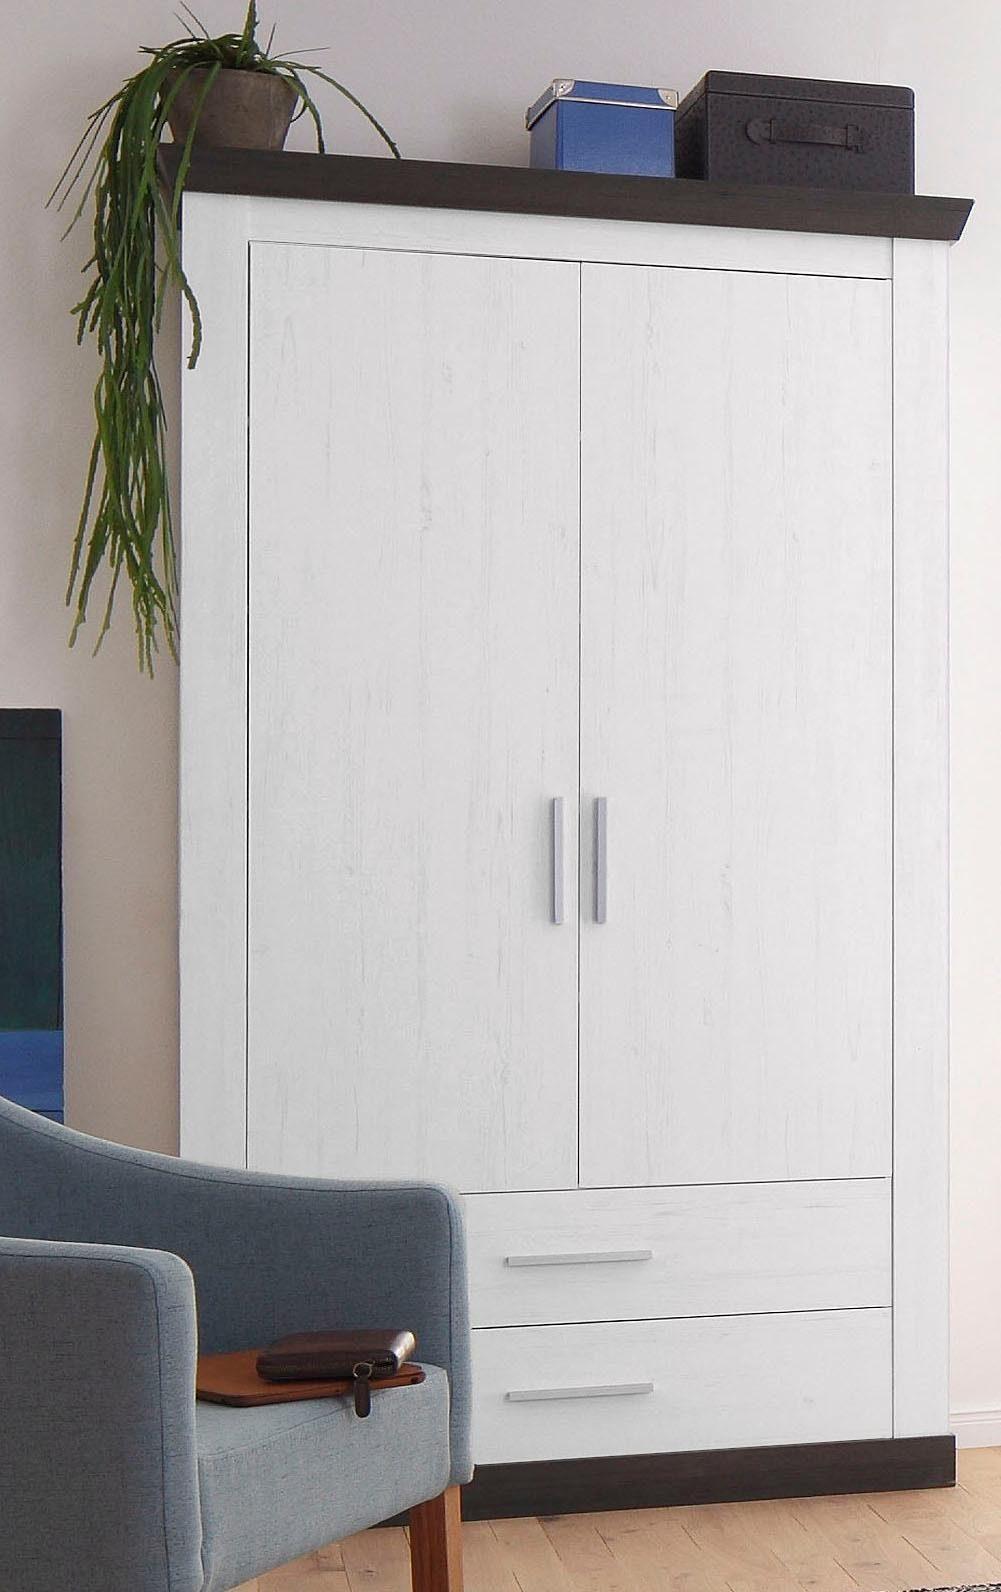 Home affaire Garderobenschrank »Siena«, 2-türig